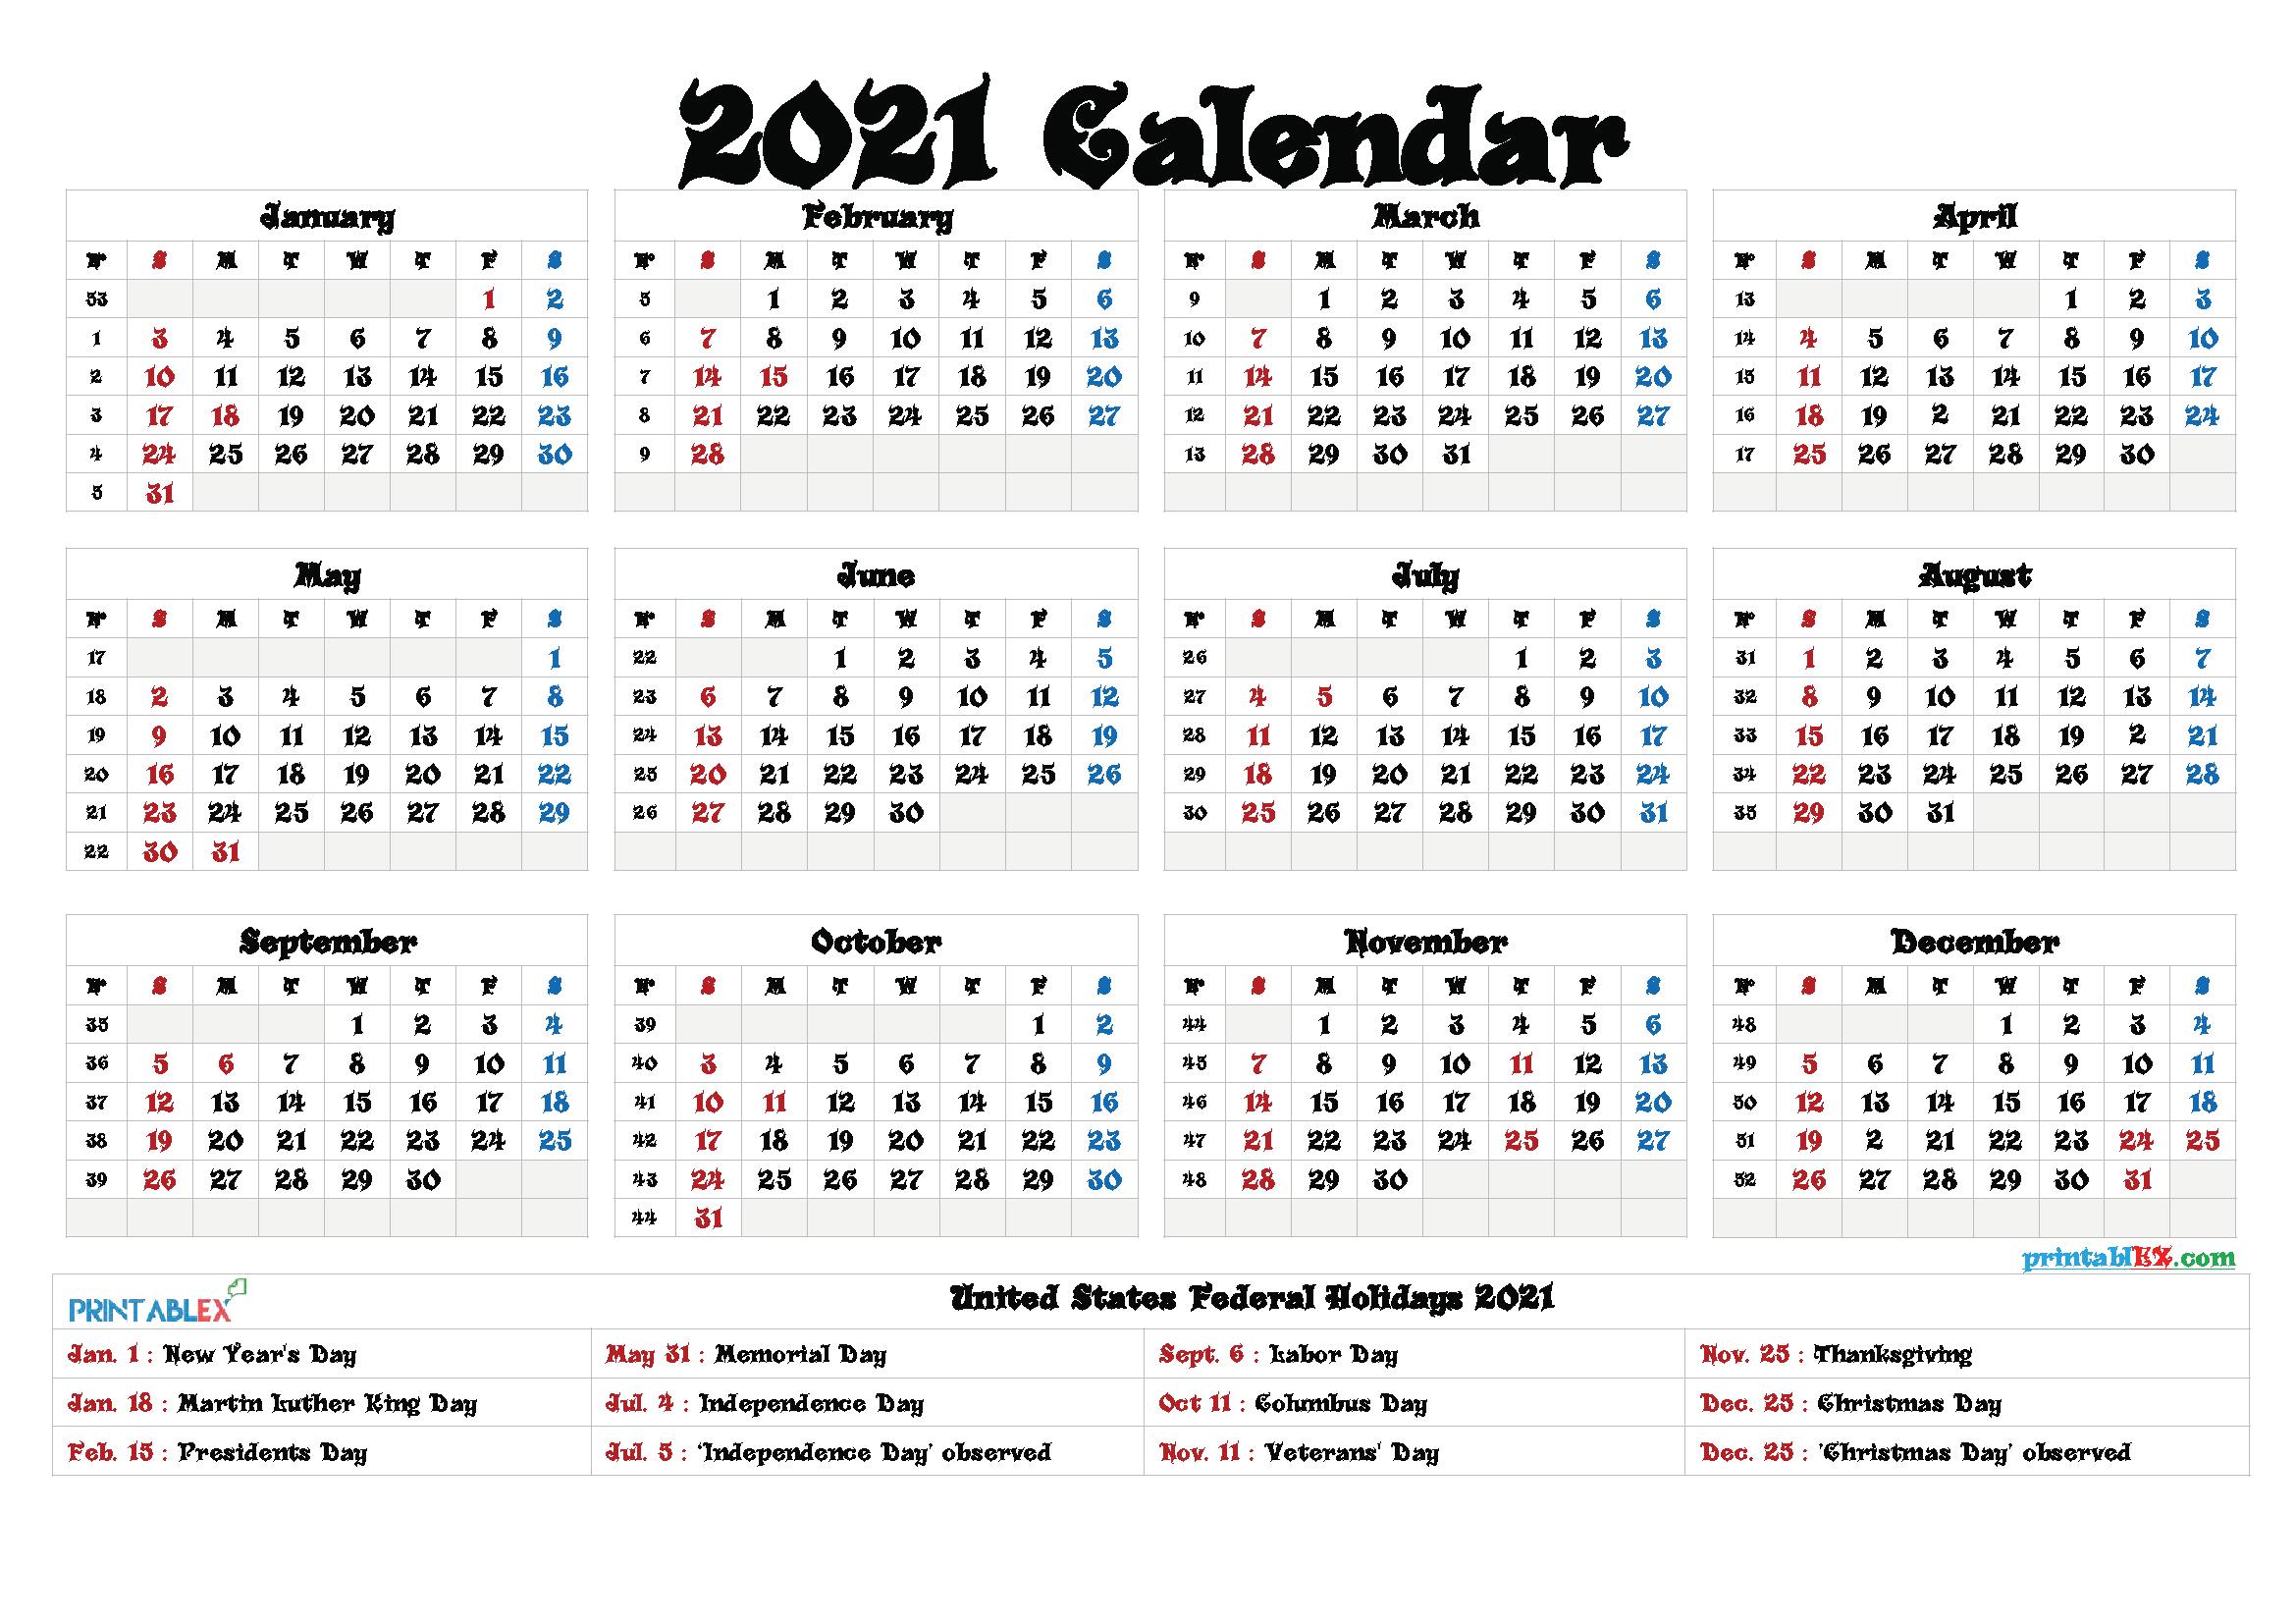 Printable 2021 Calendar With Federal Holidays | Printable  Easy To Print 2021 Calendar